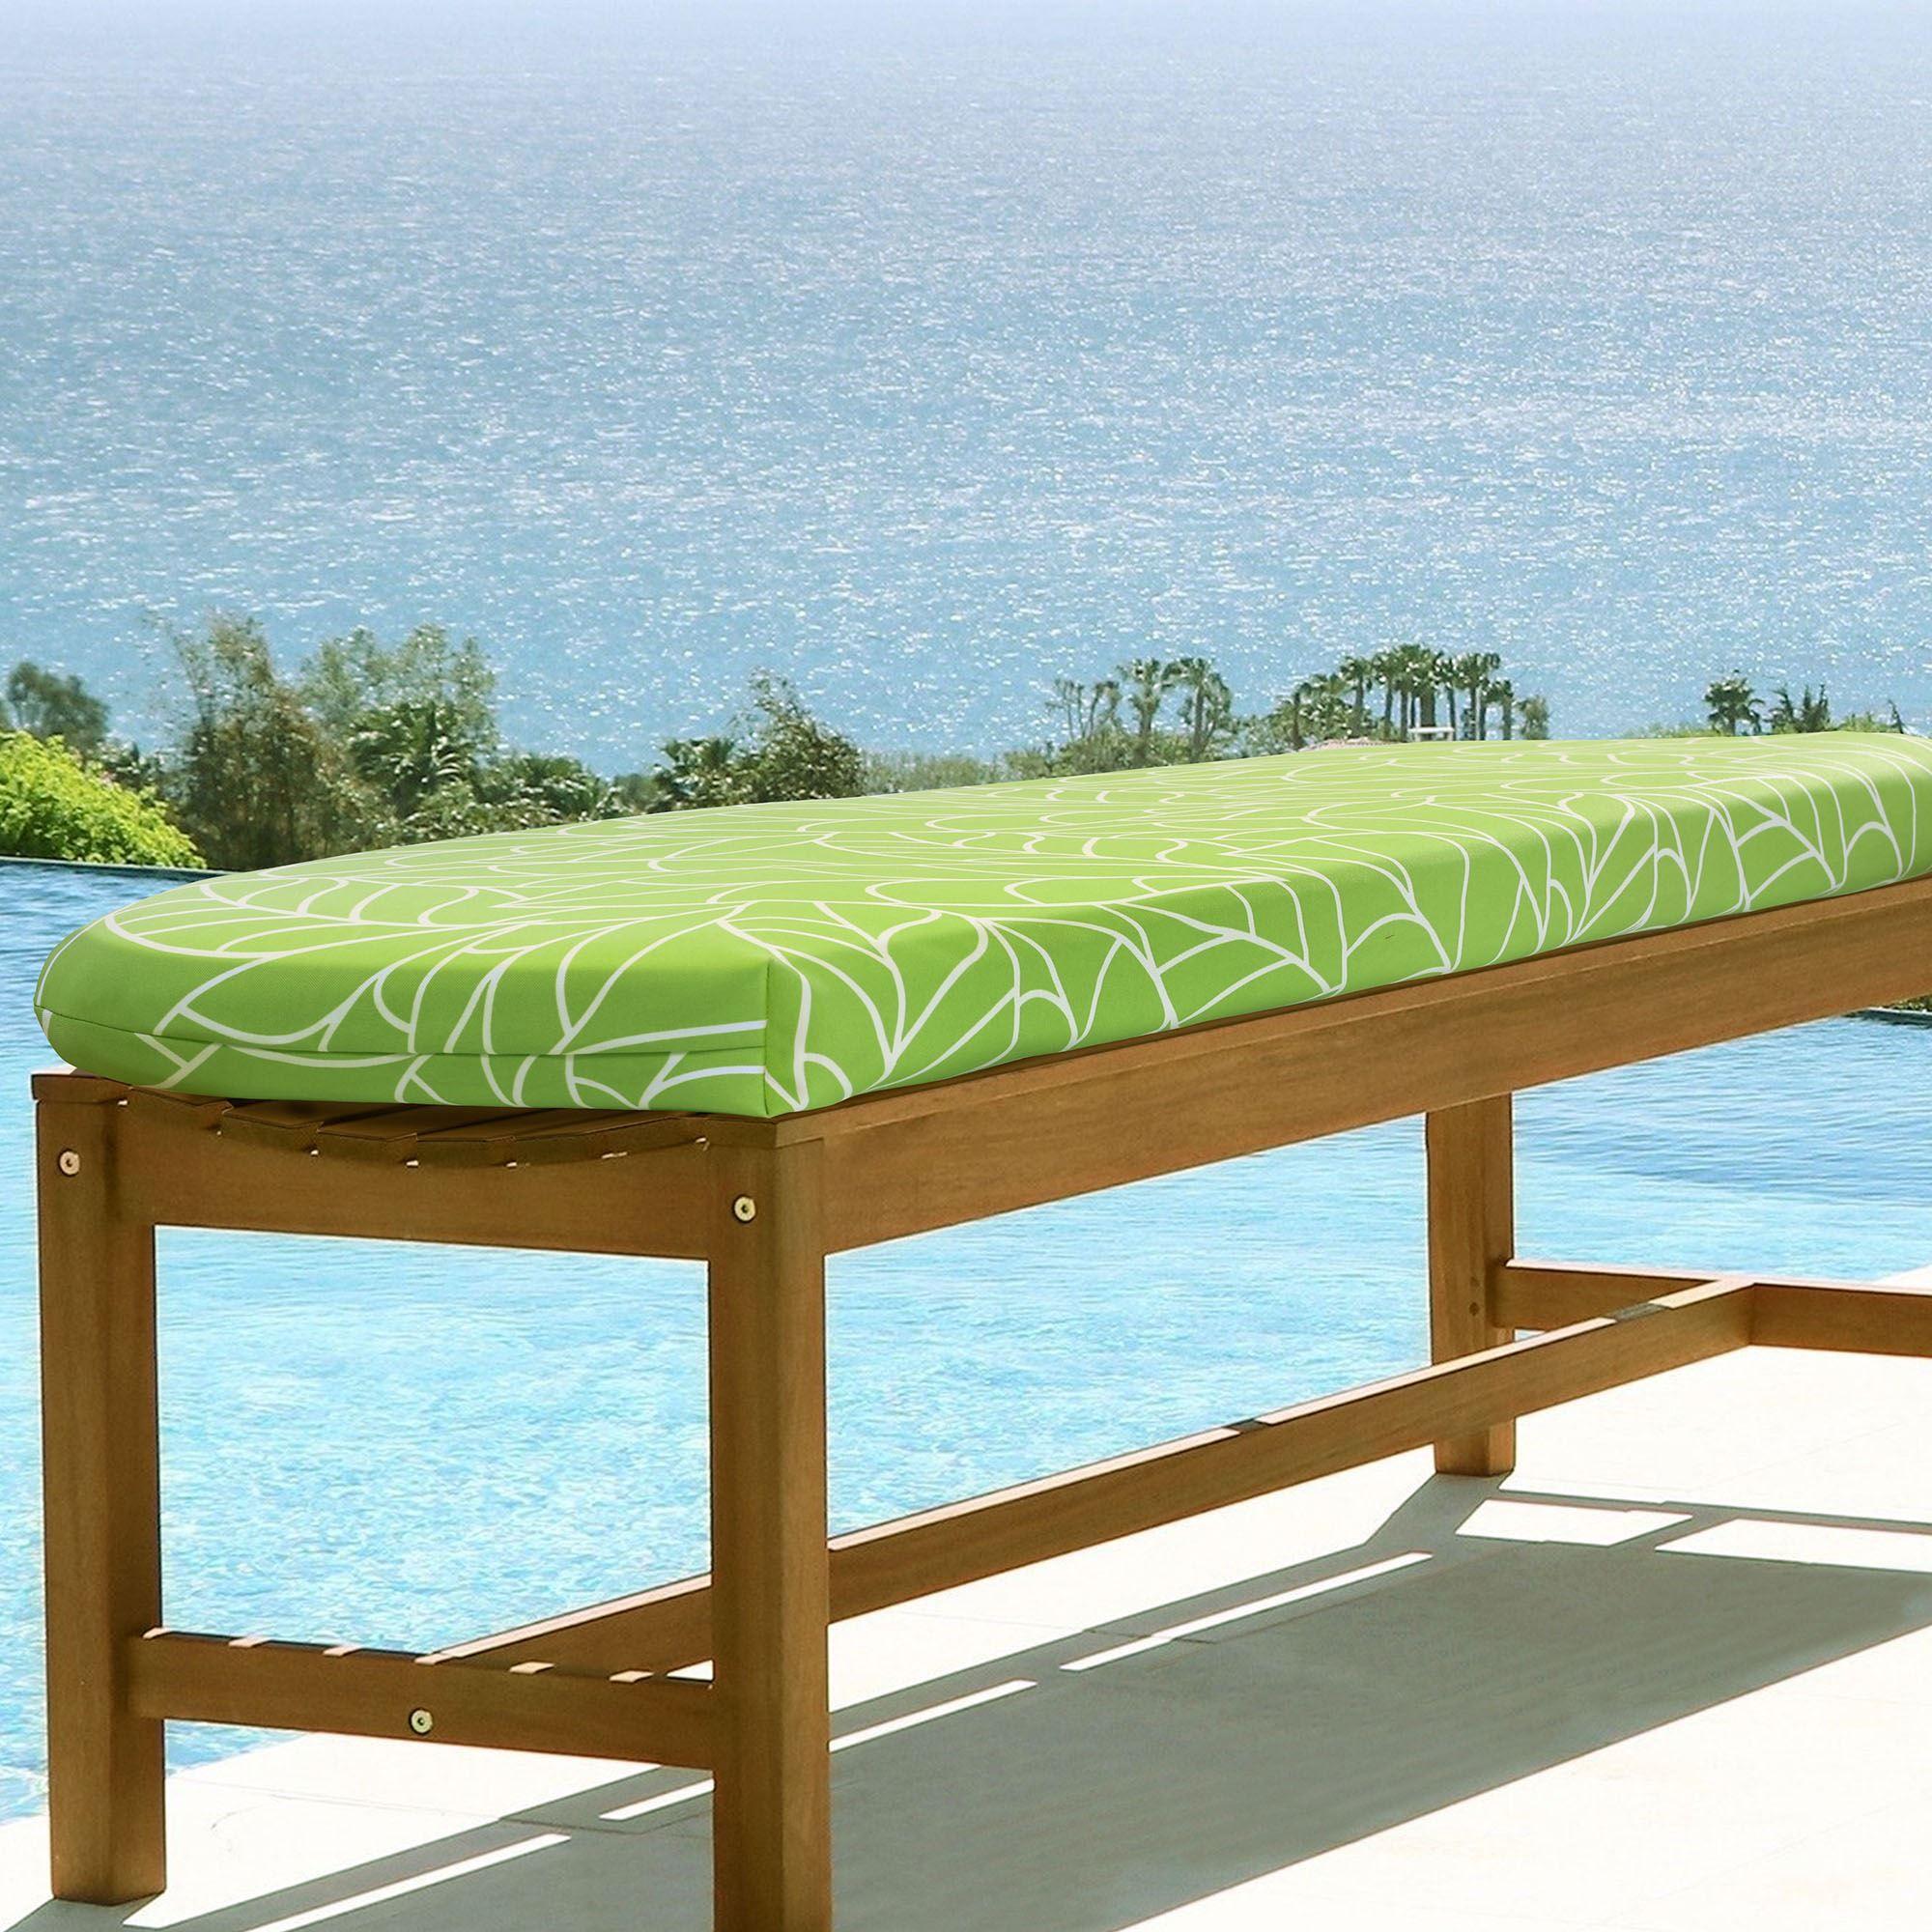 Awesome Avra Reversible Green Tropical Indoor Outdoor Bench Seat Cushion Creativecarmelina Interior Chair Design Creativecarmelinacom